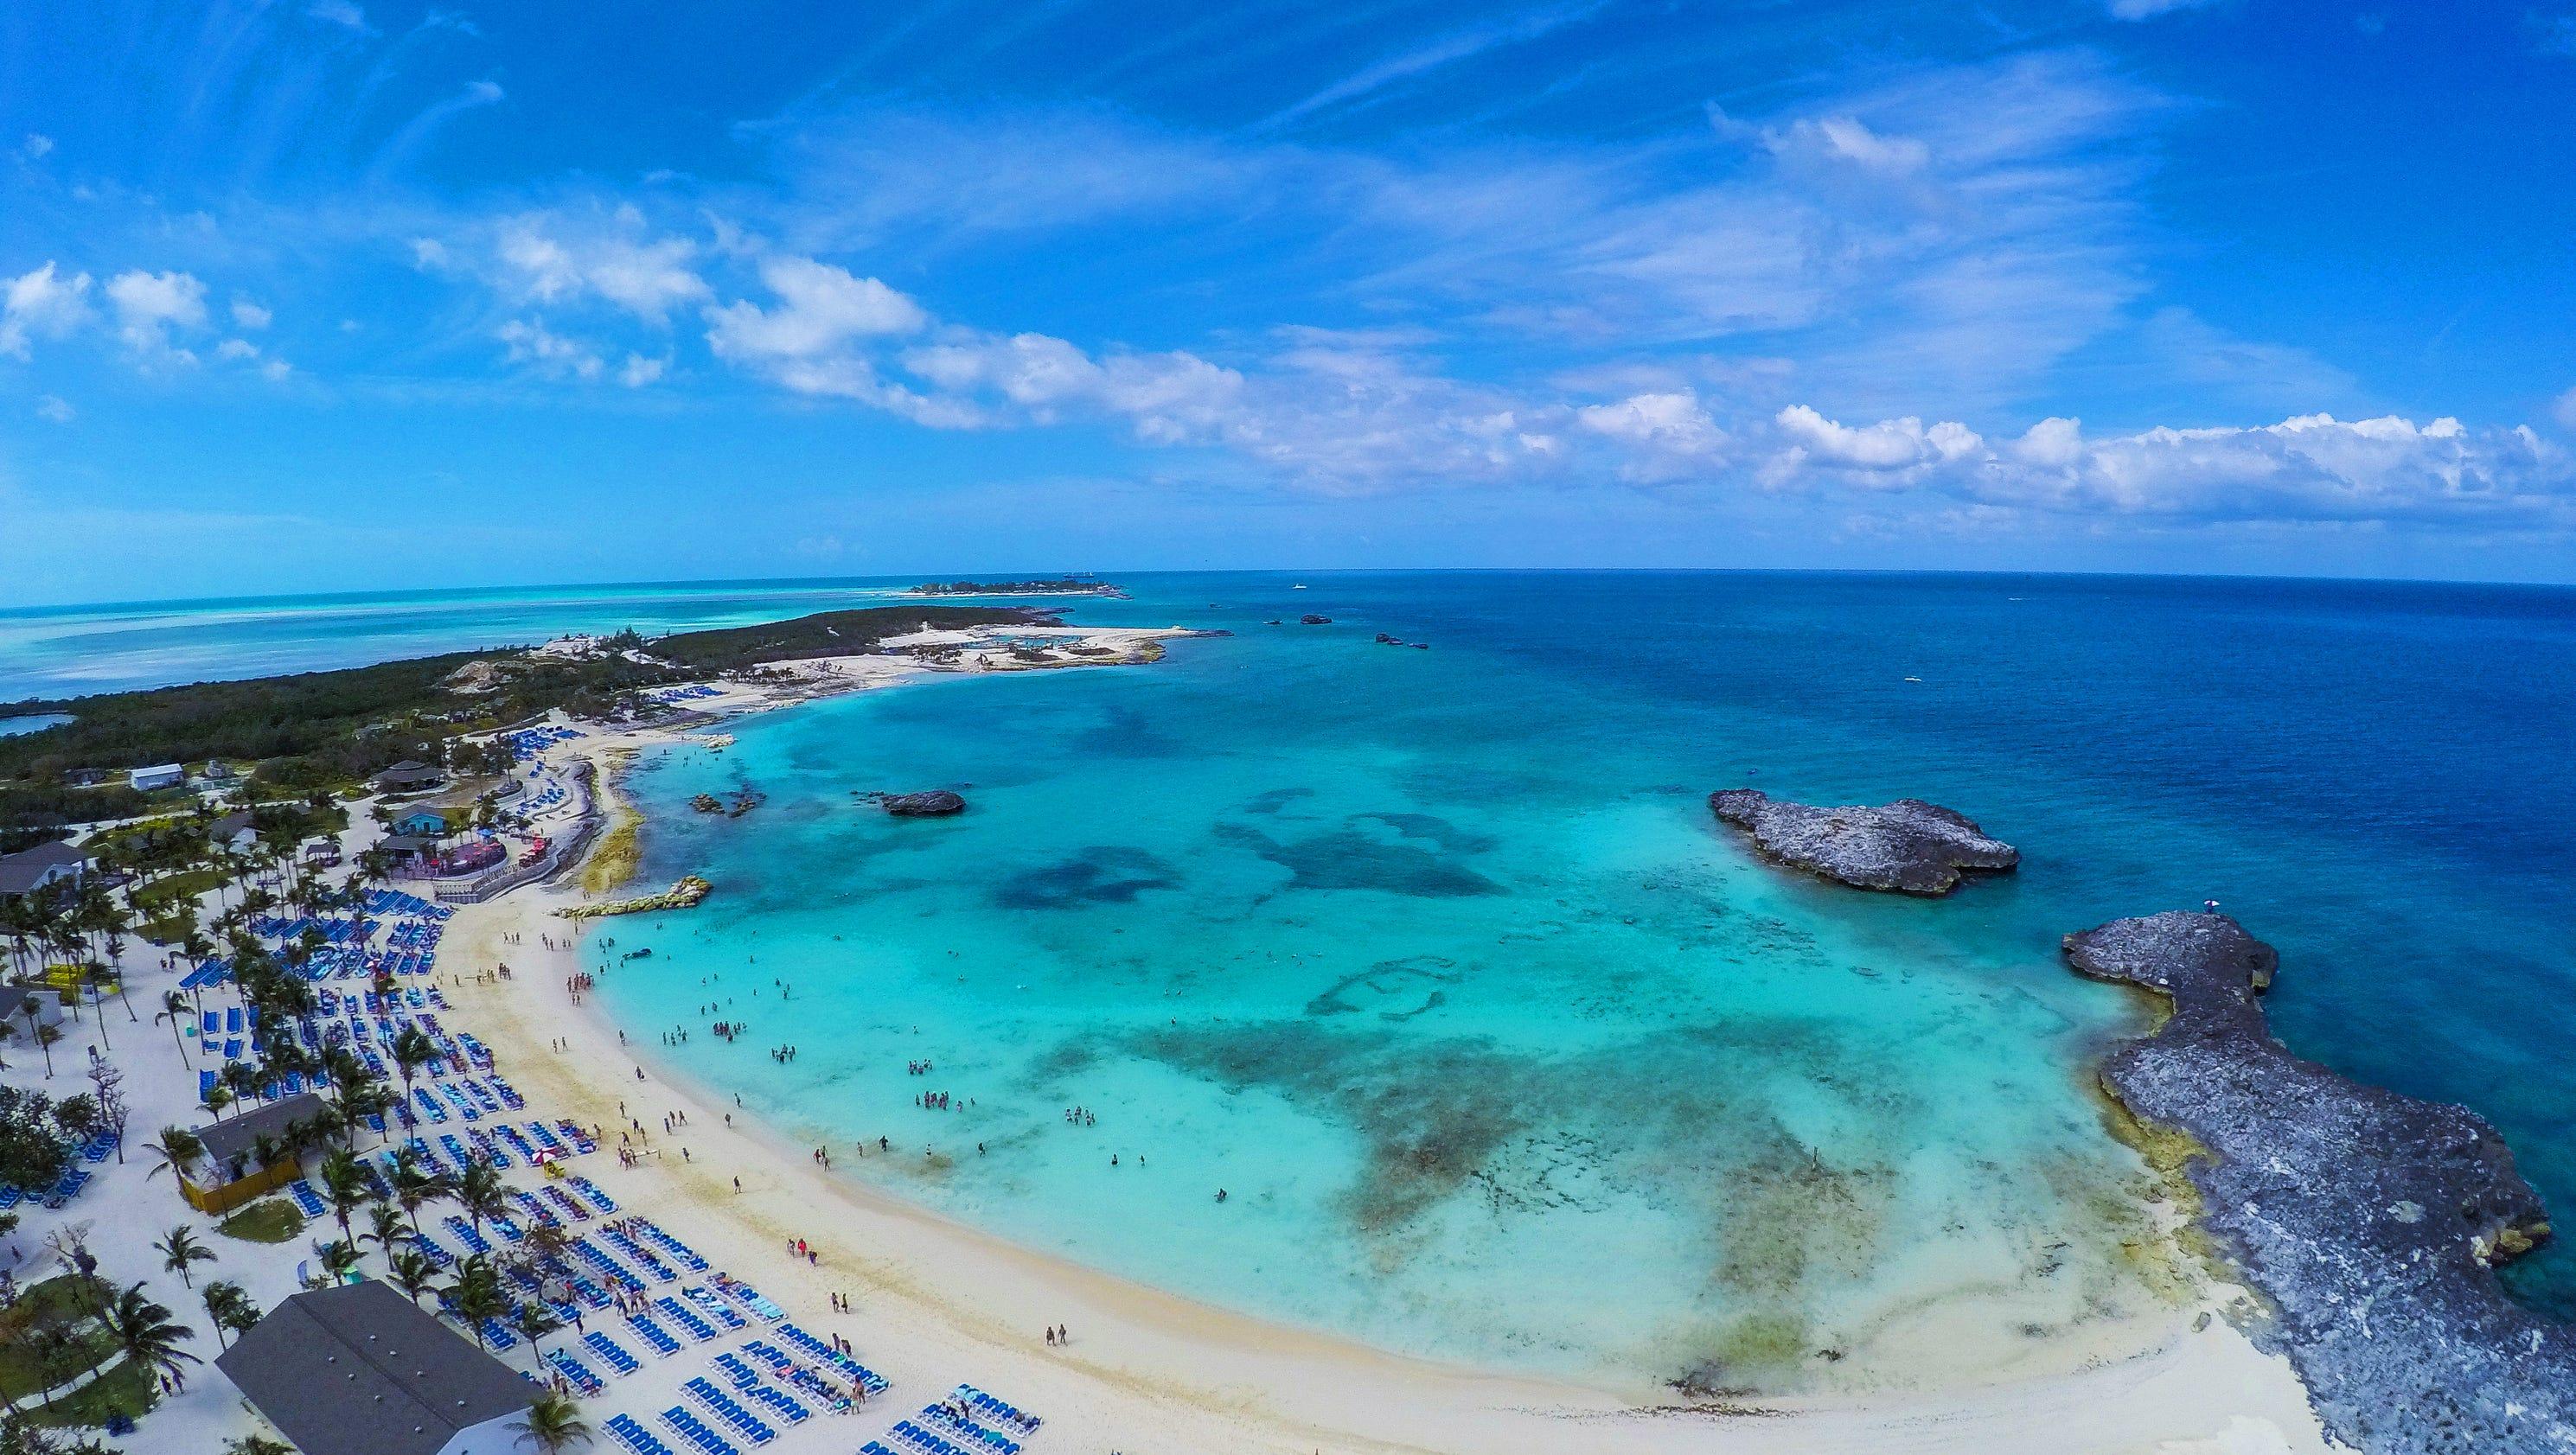 Great Stirrup Cay Norwegian Cruise Line S Private Island